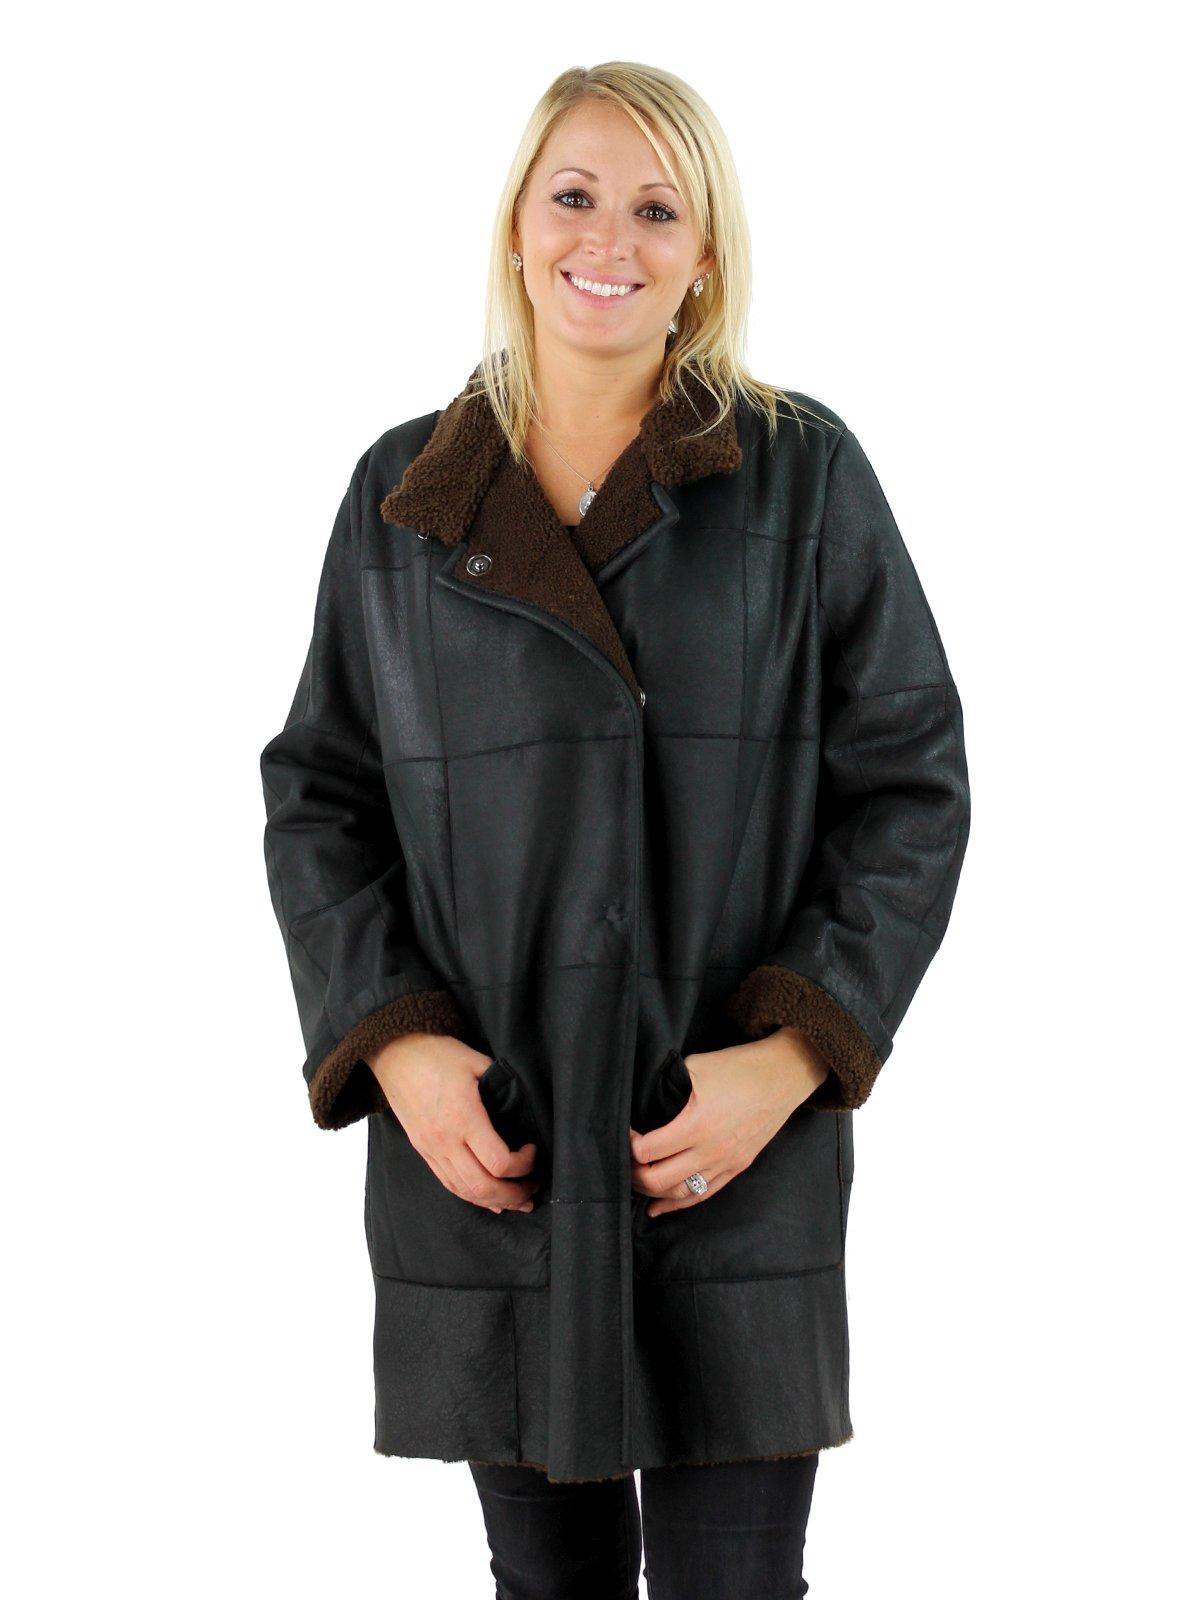 Woman's Black and Cognac Shearling Lamb Jacket